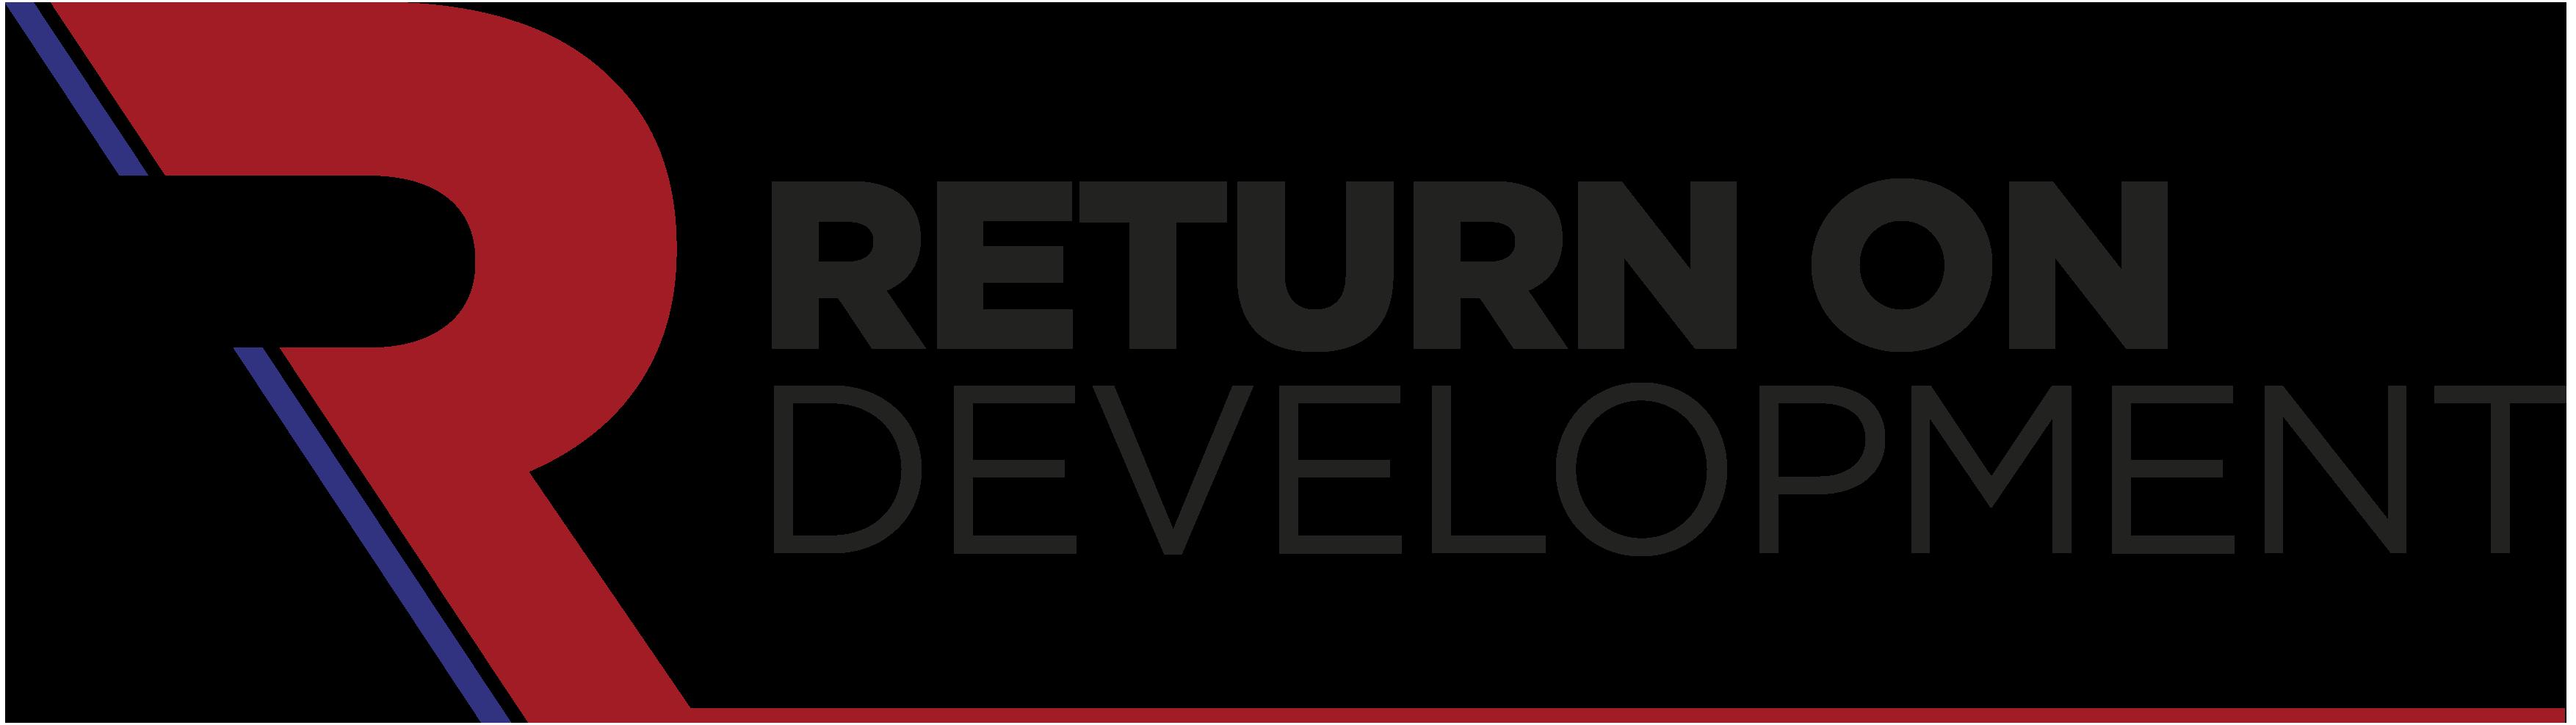 Return on Development